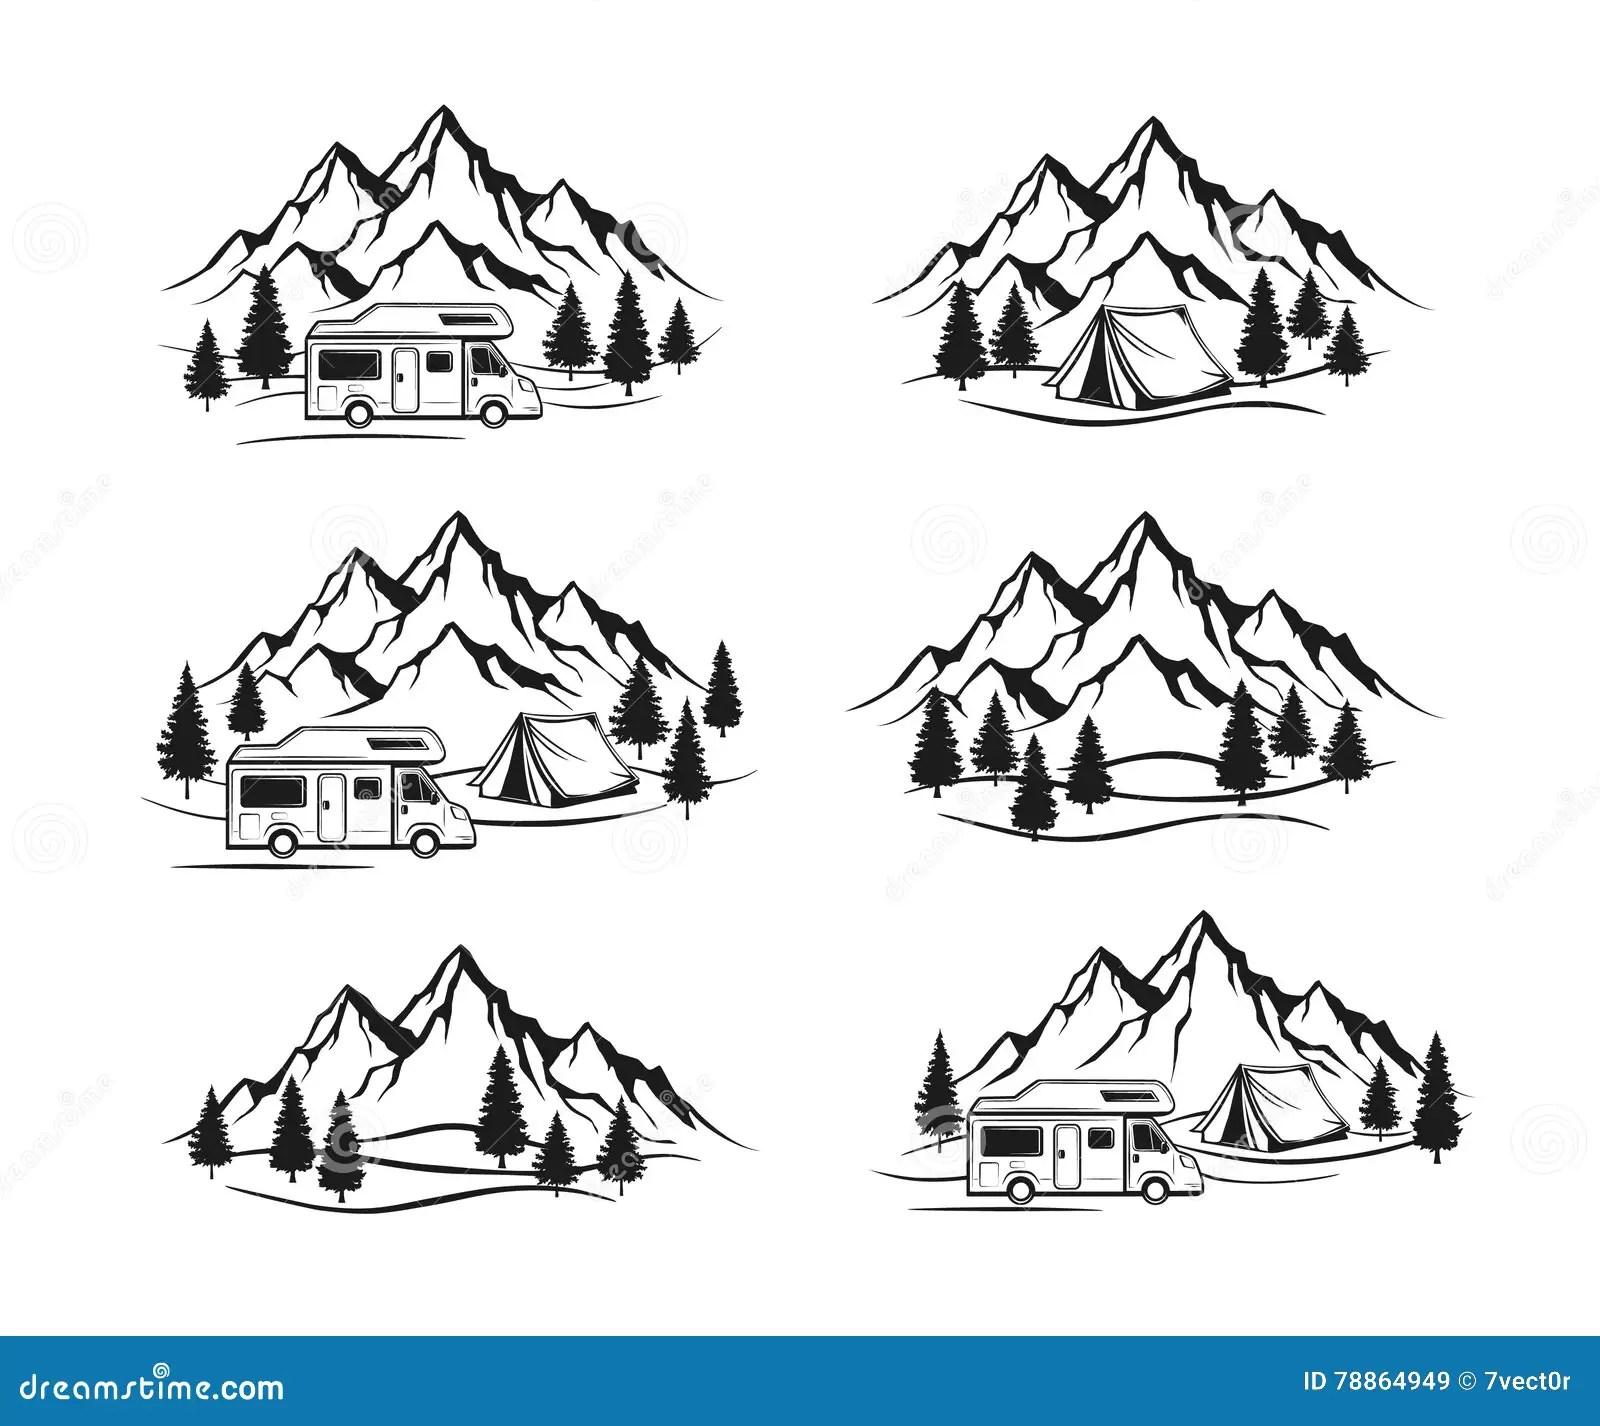 Campsite With Camper Caravan Tent Rocky Mountains Pine